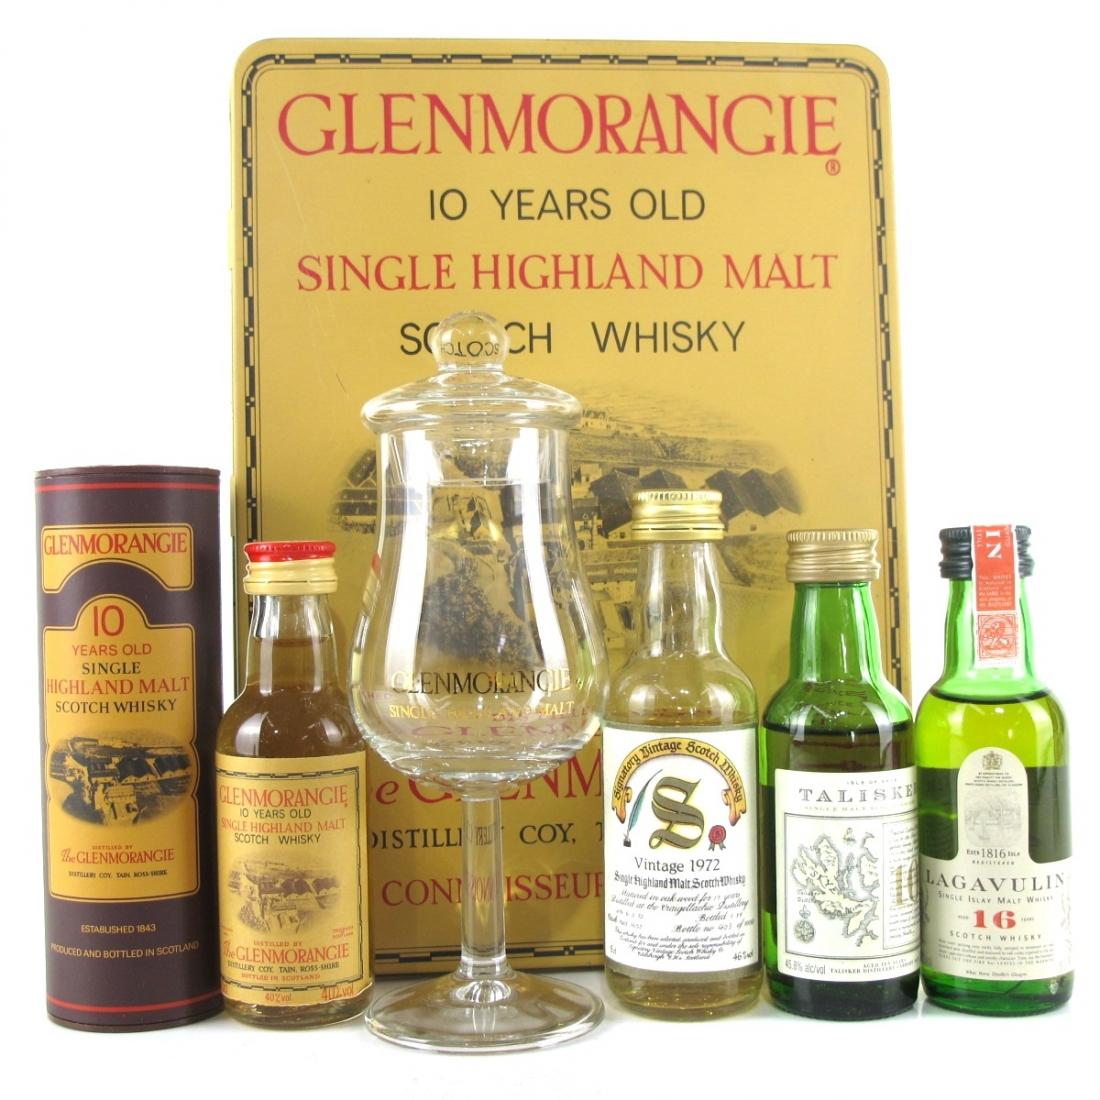 Single Malt Miniature Selection 4 x 5cl / Including Glenmorangie Gift Pack